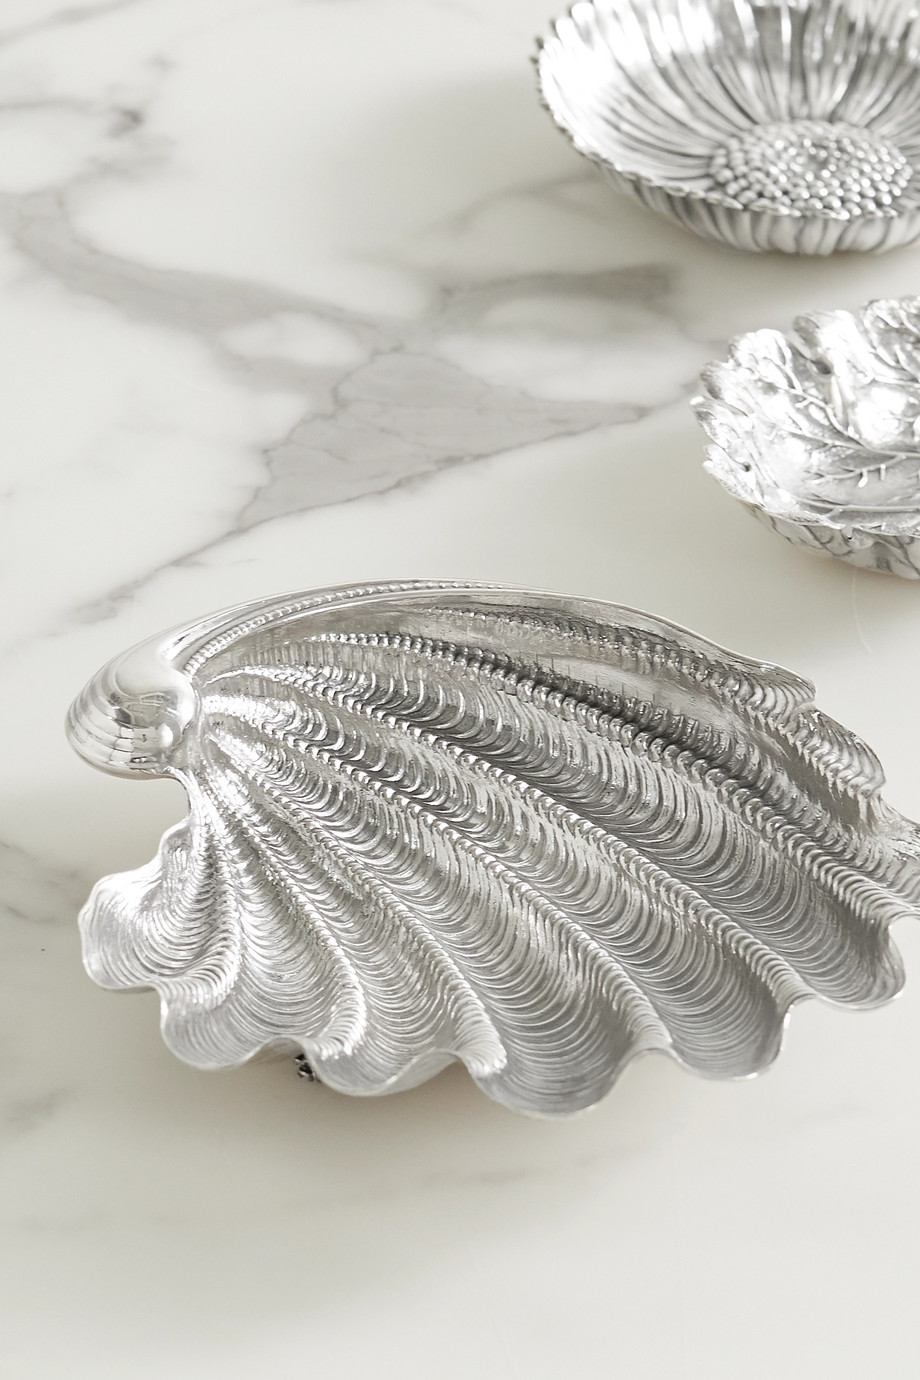 Buccellati Tridacna silver bowl